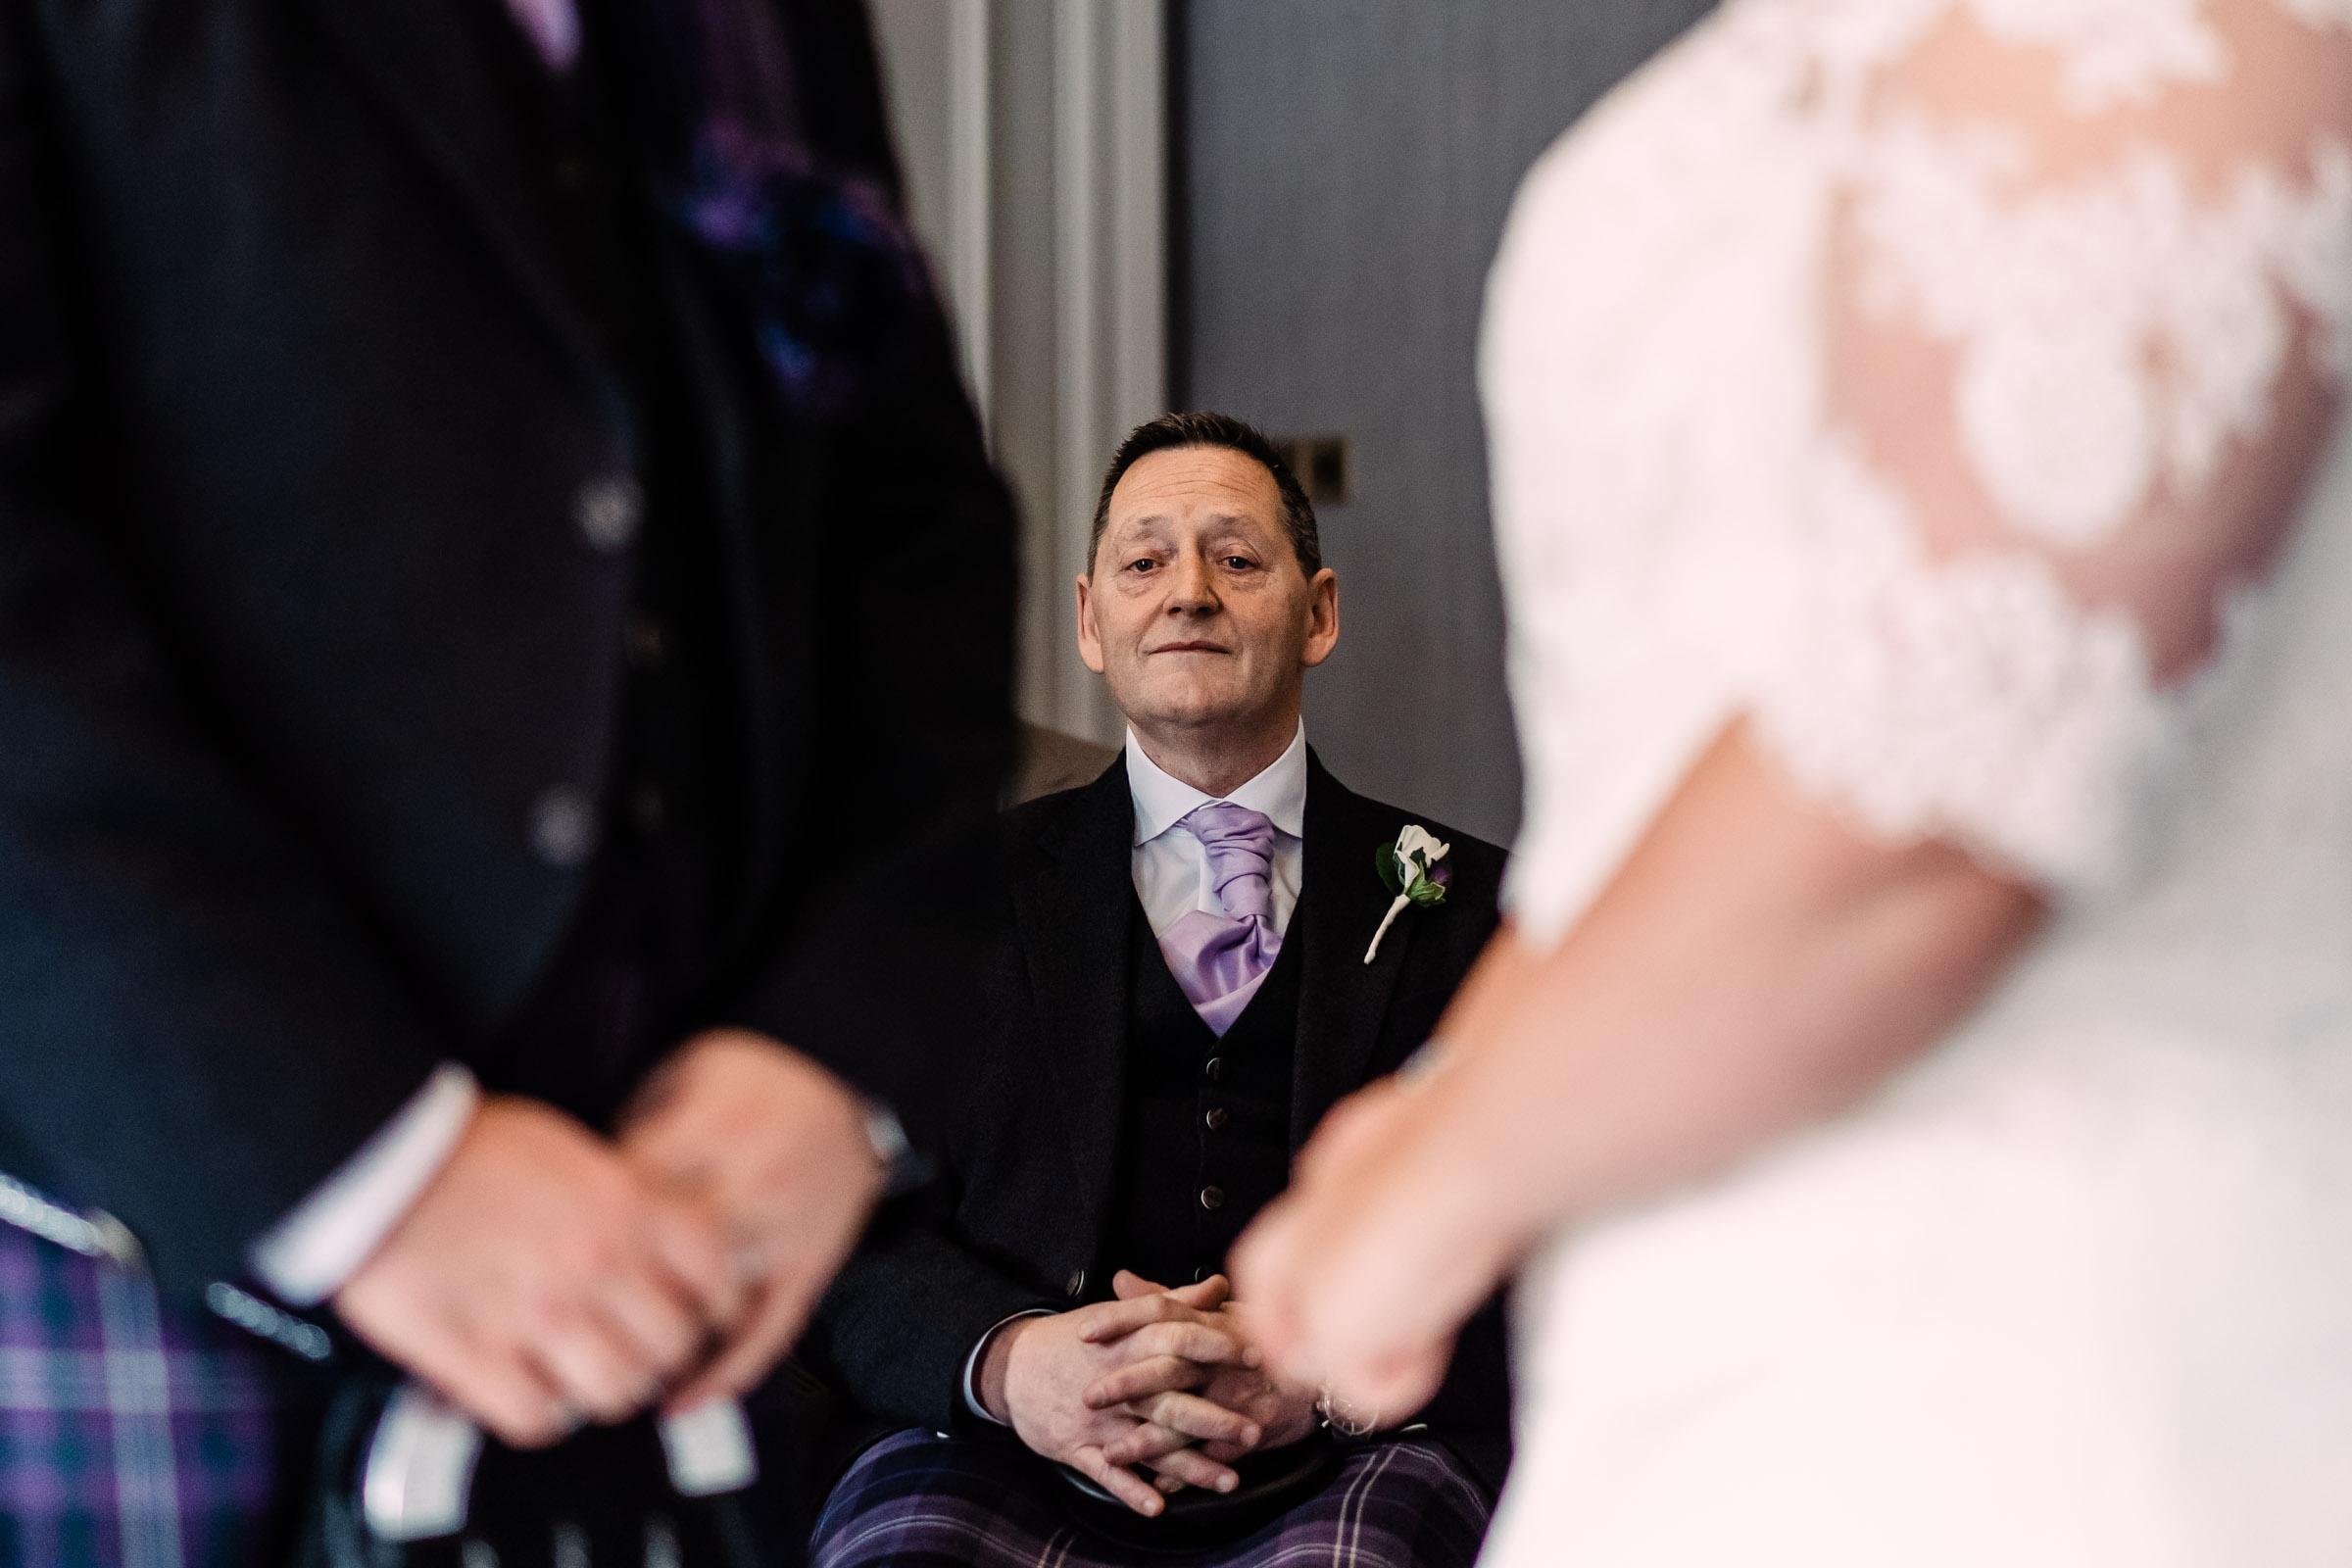 motherwell-moorings-wedding-photographer-dearlyphotography (43 of 77).jpg